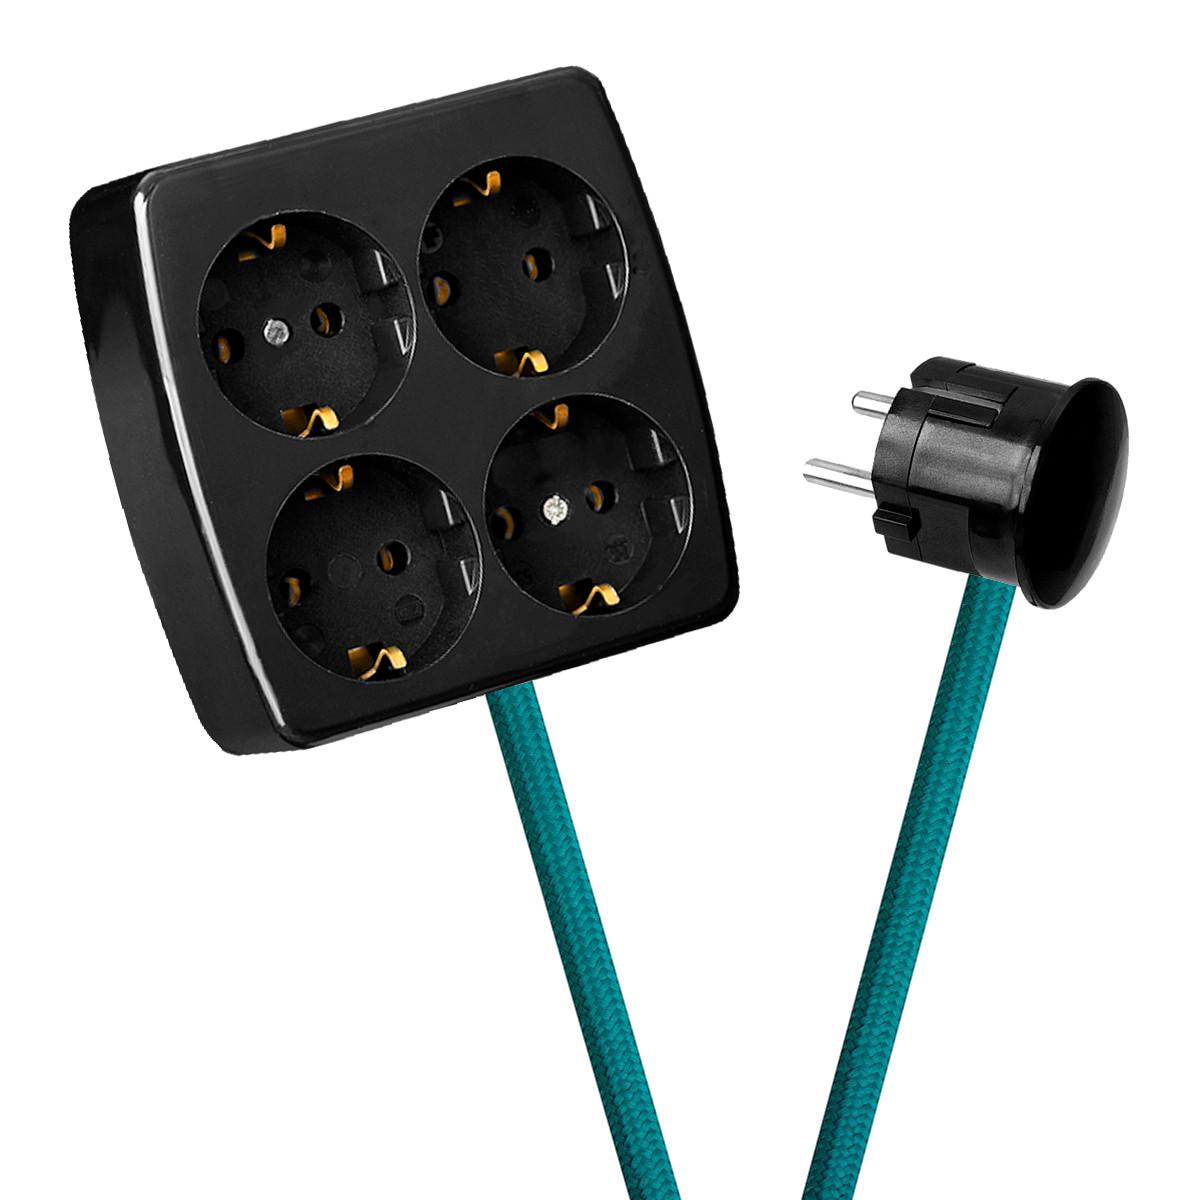 Black 4-Way Socket Outlet Turquoise